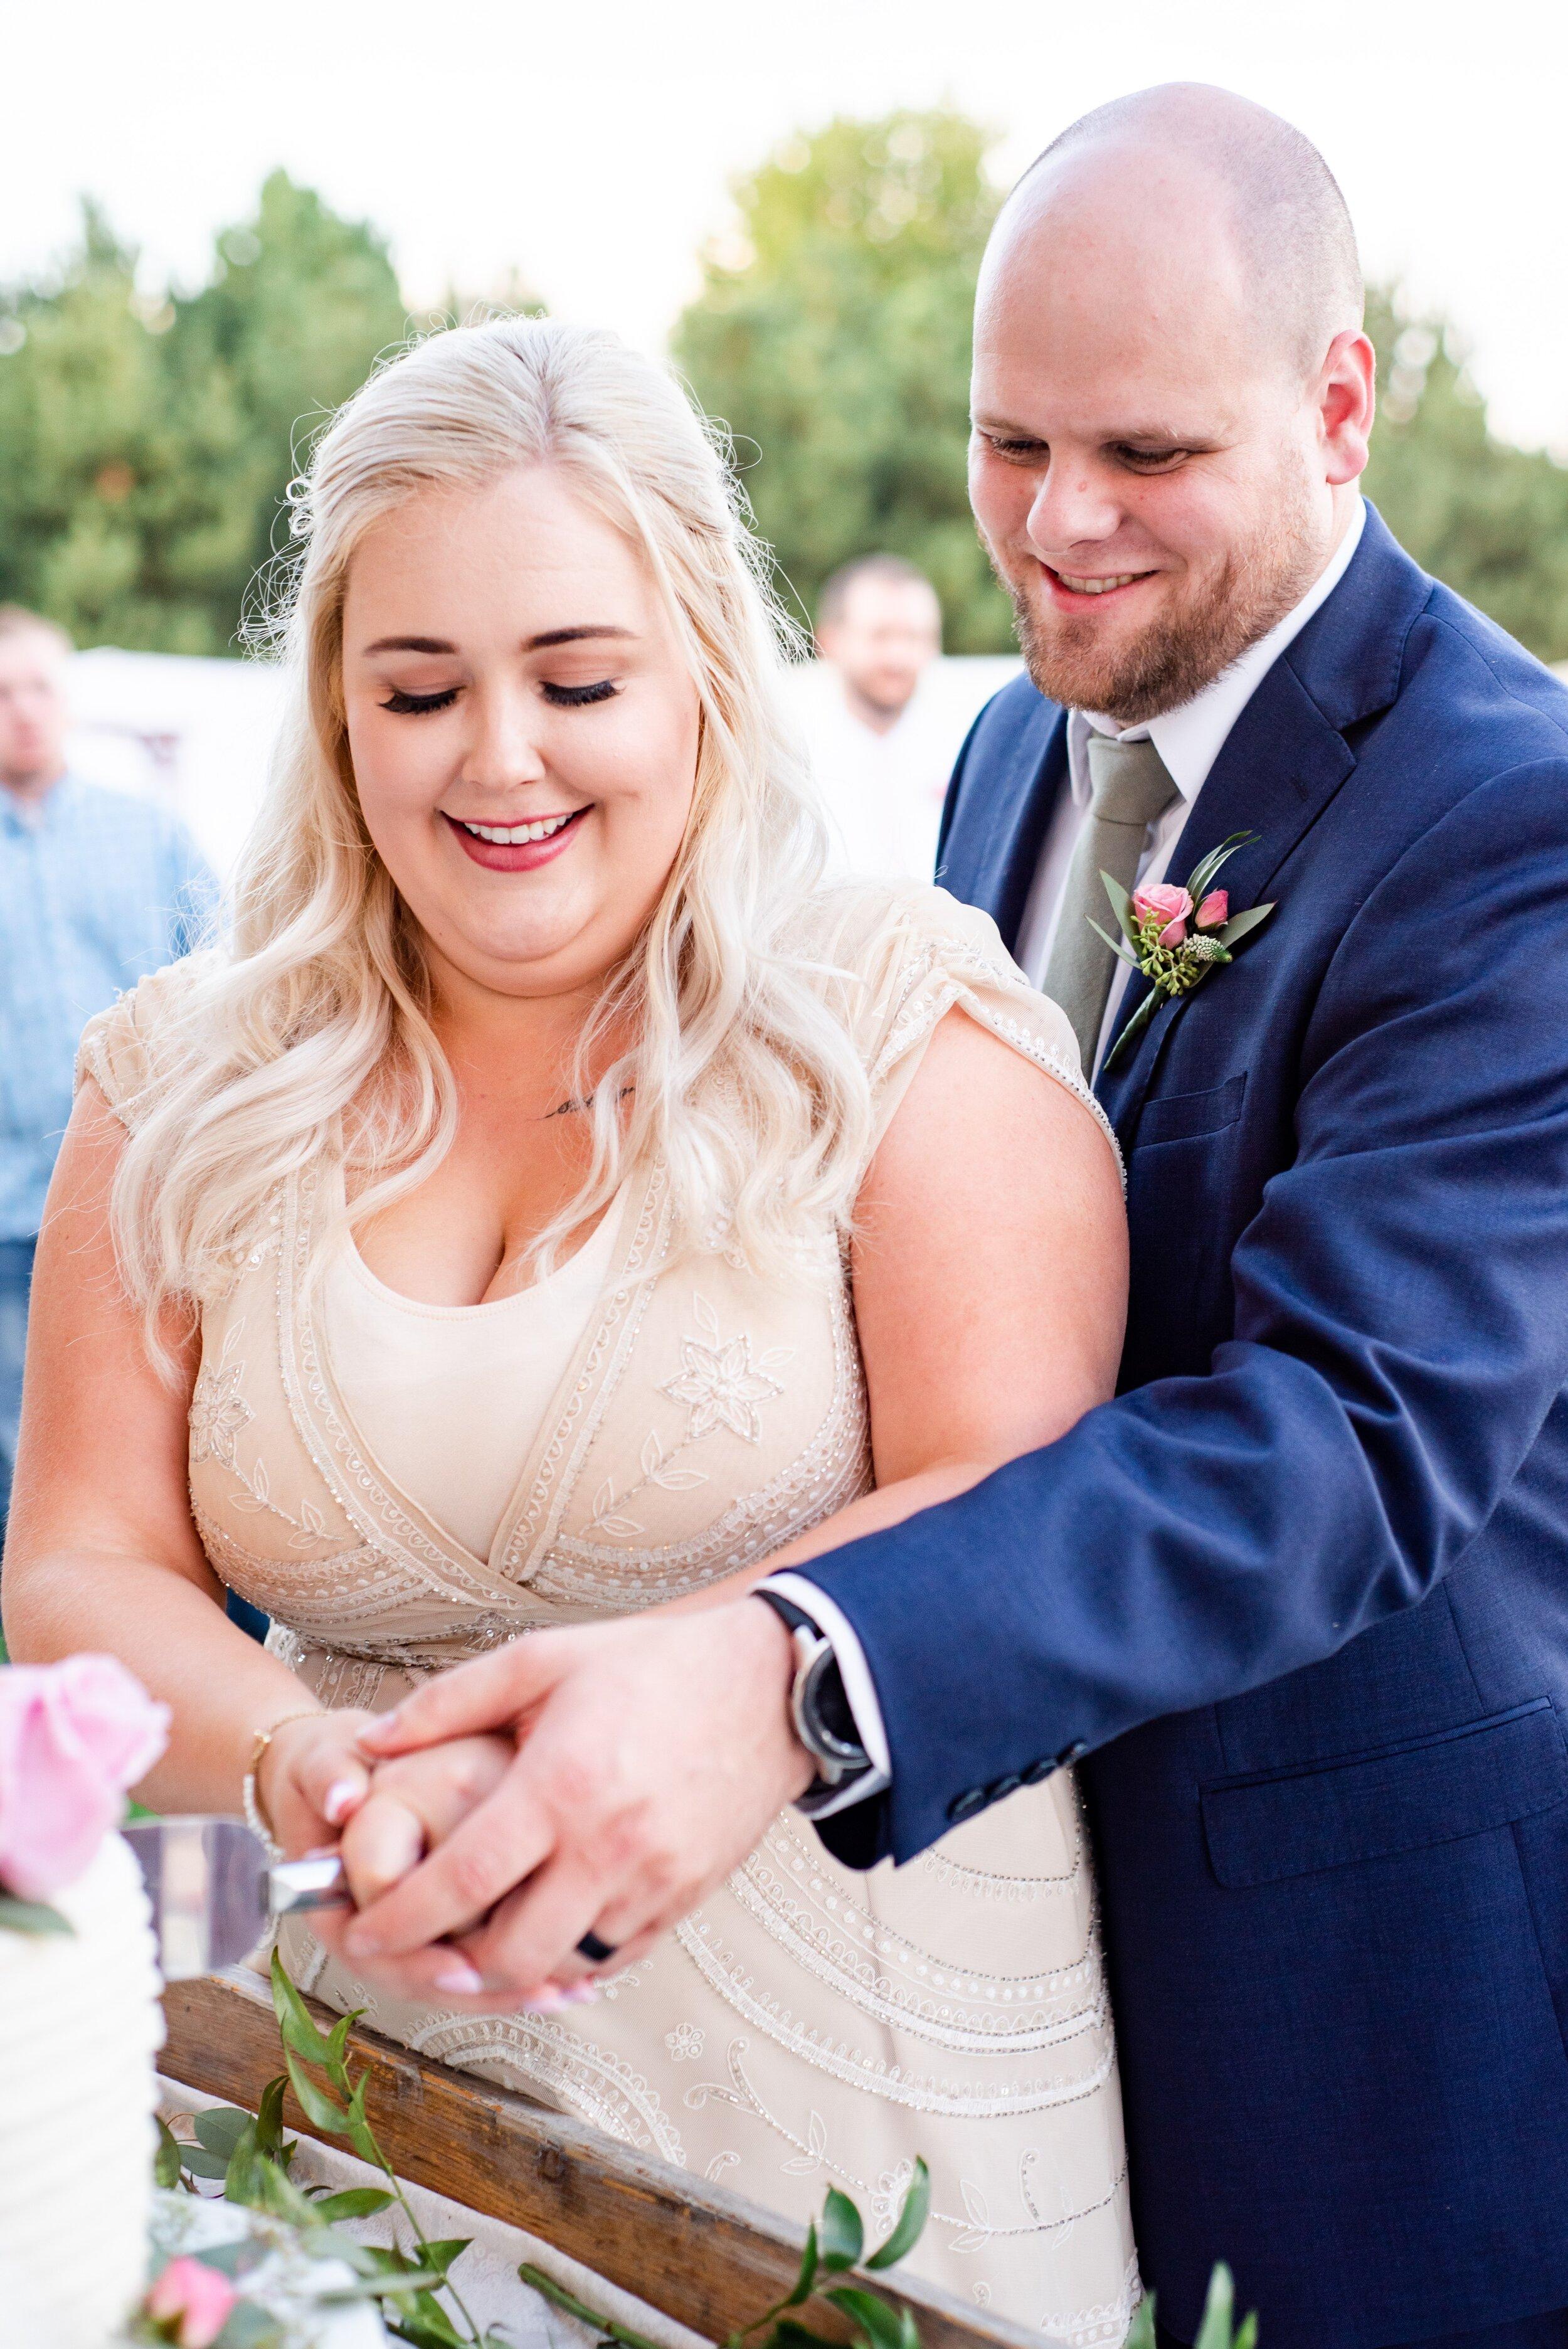 Bride & Groom Cutting Cake - Tri Cities Wedding Photographer - Morgan Tayler Photo & Design - Tri Cities Washington Backyard Wedding